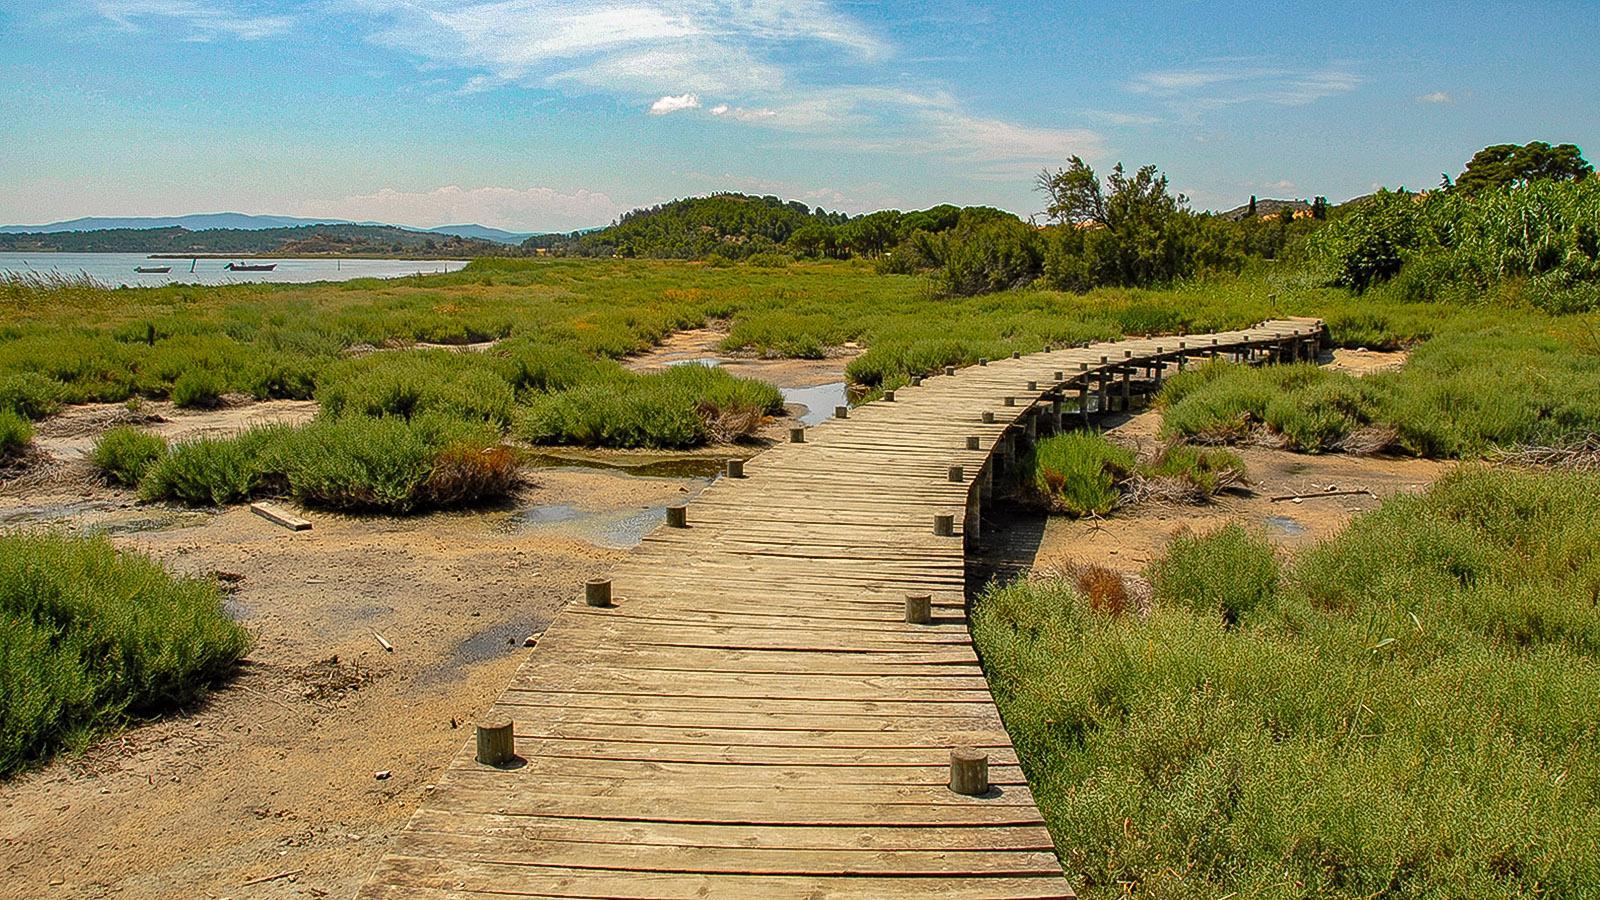 Lagunenseen des Languedoc: Ein Bohlenweg erschließt das Ufer des Étang de Bages. Foto: Hilke Maunder